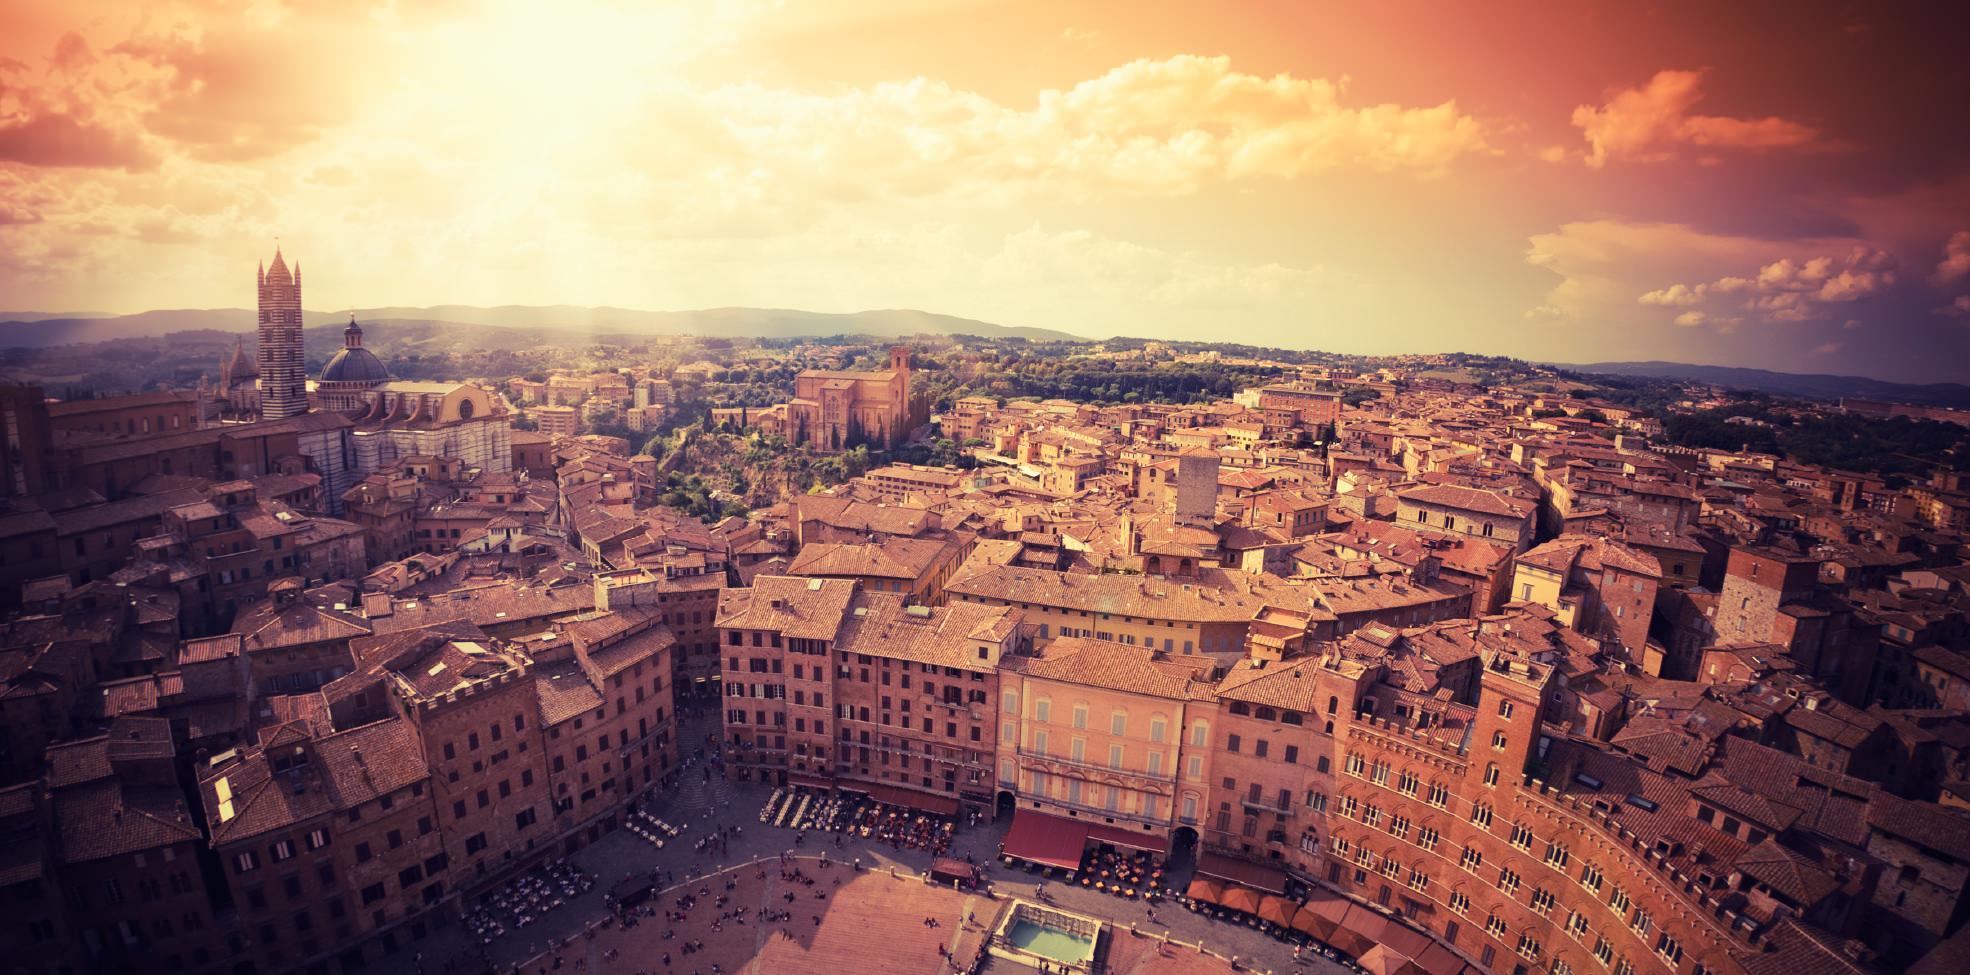 Siena - Luoghi da fotografare in Toscana